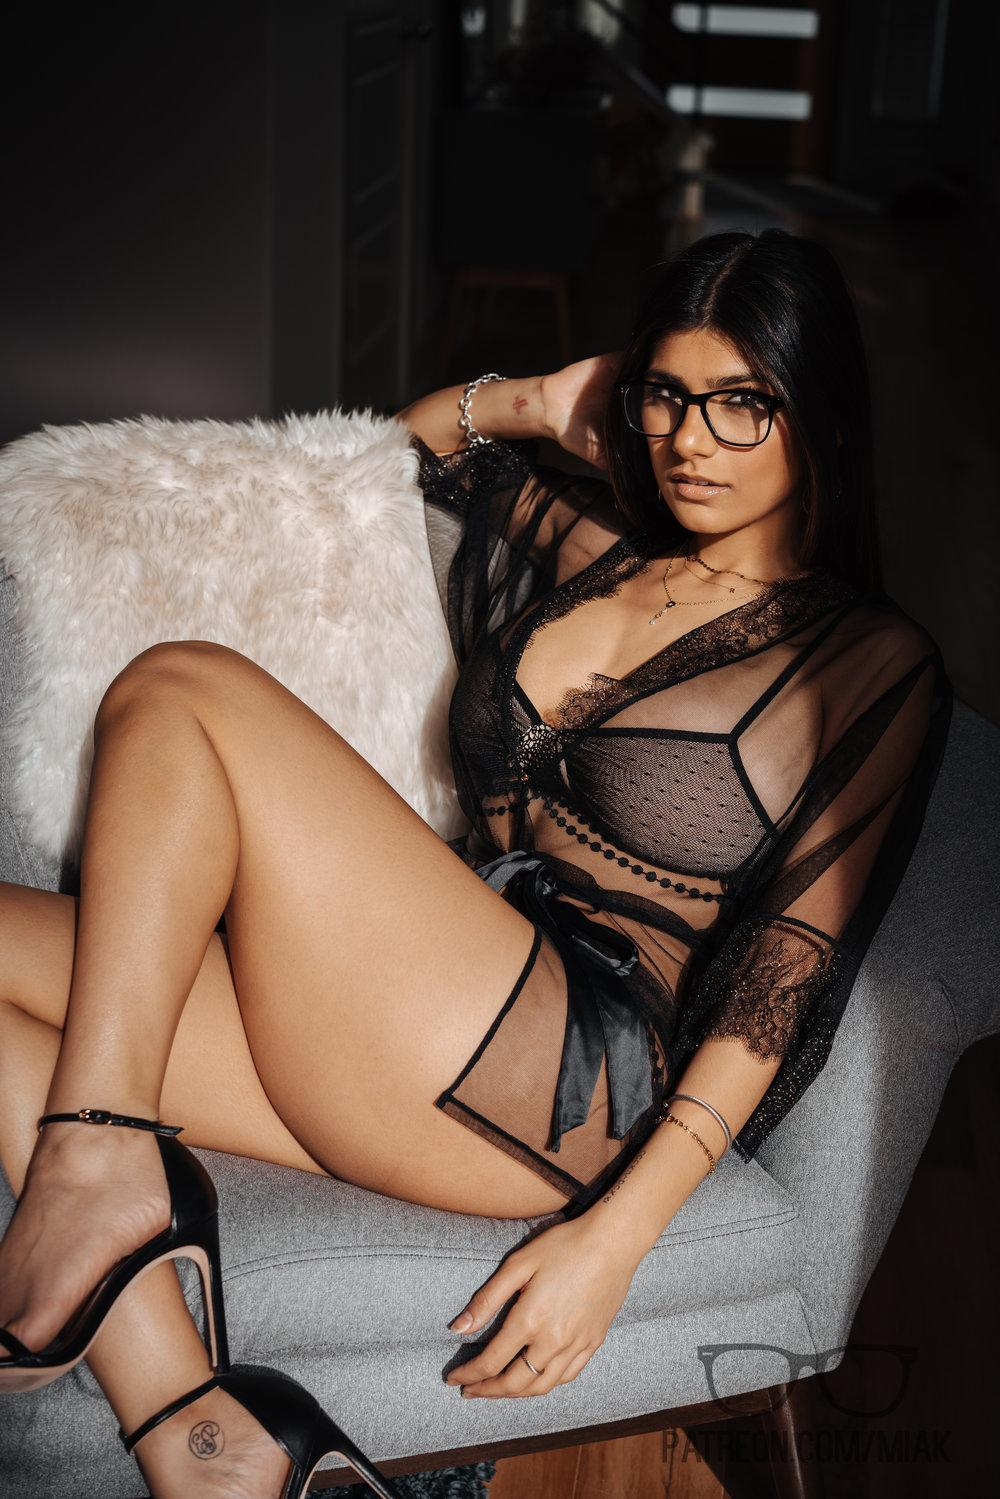 Mia Khalifa Lingerie Stiletto Heels Photoshoot Leaked 0013